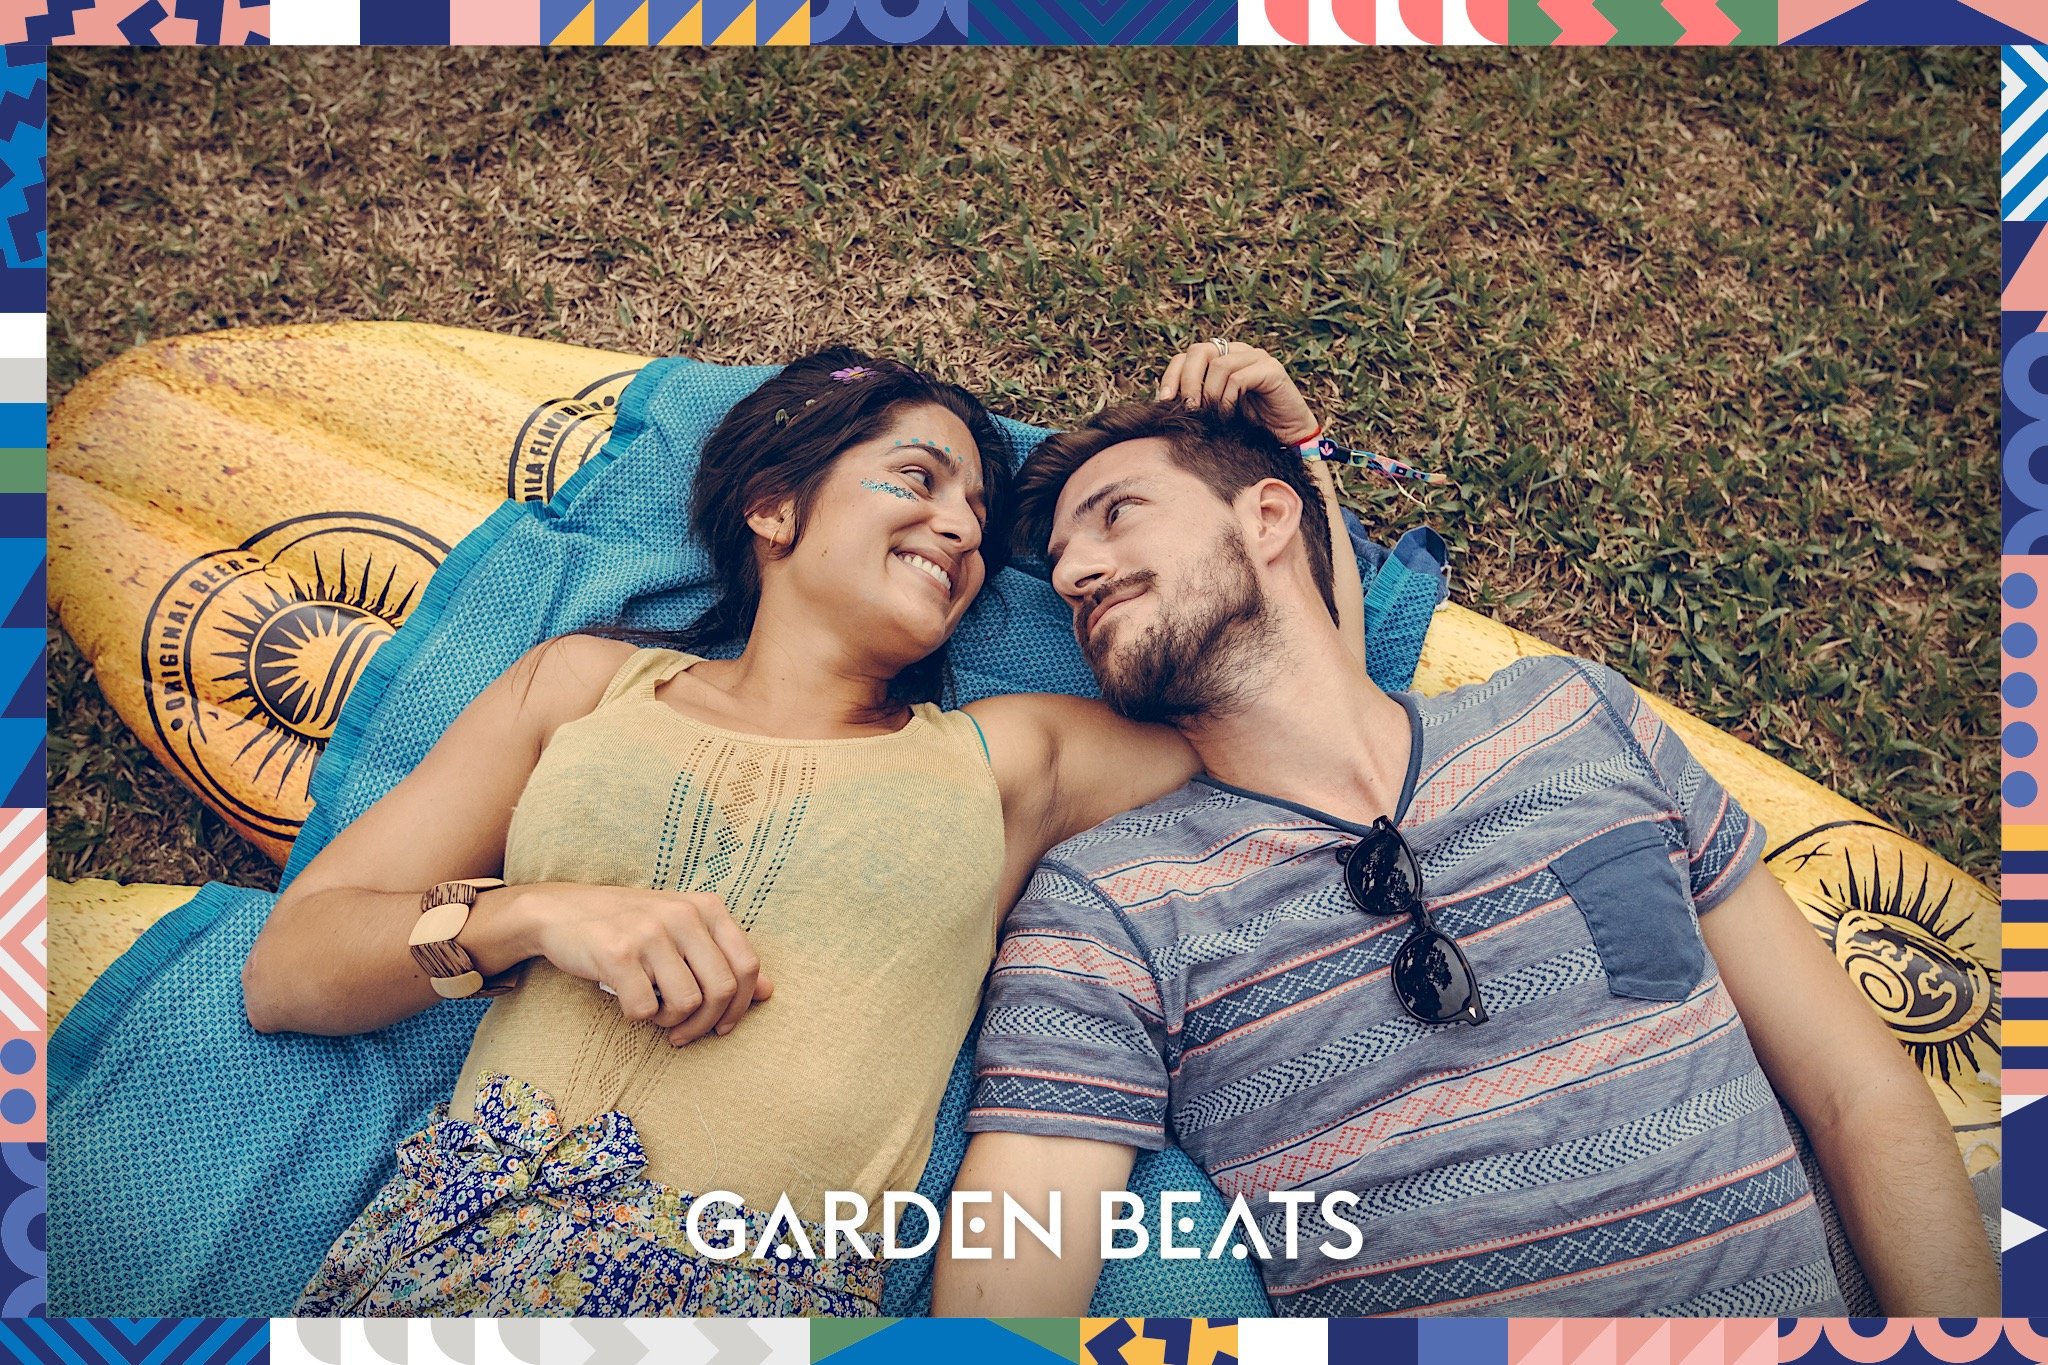 03032018_GardenBeats_Colossal415_Watermarked.jpg